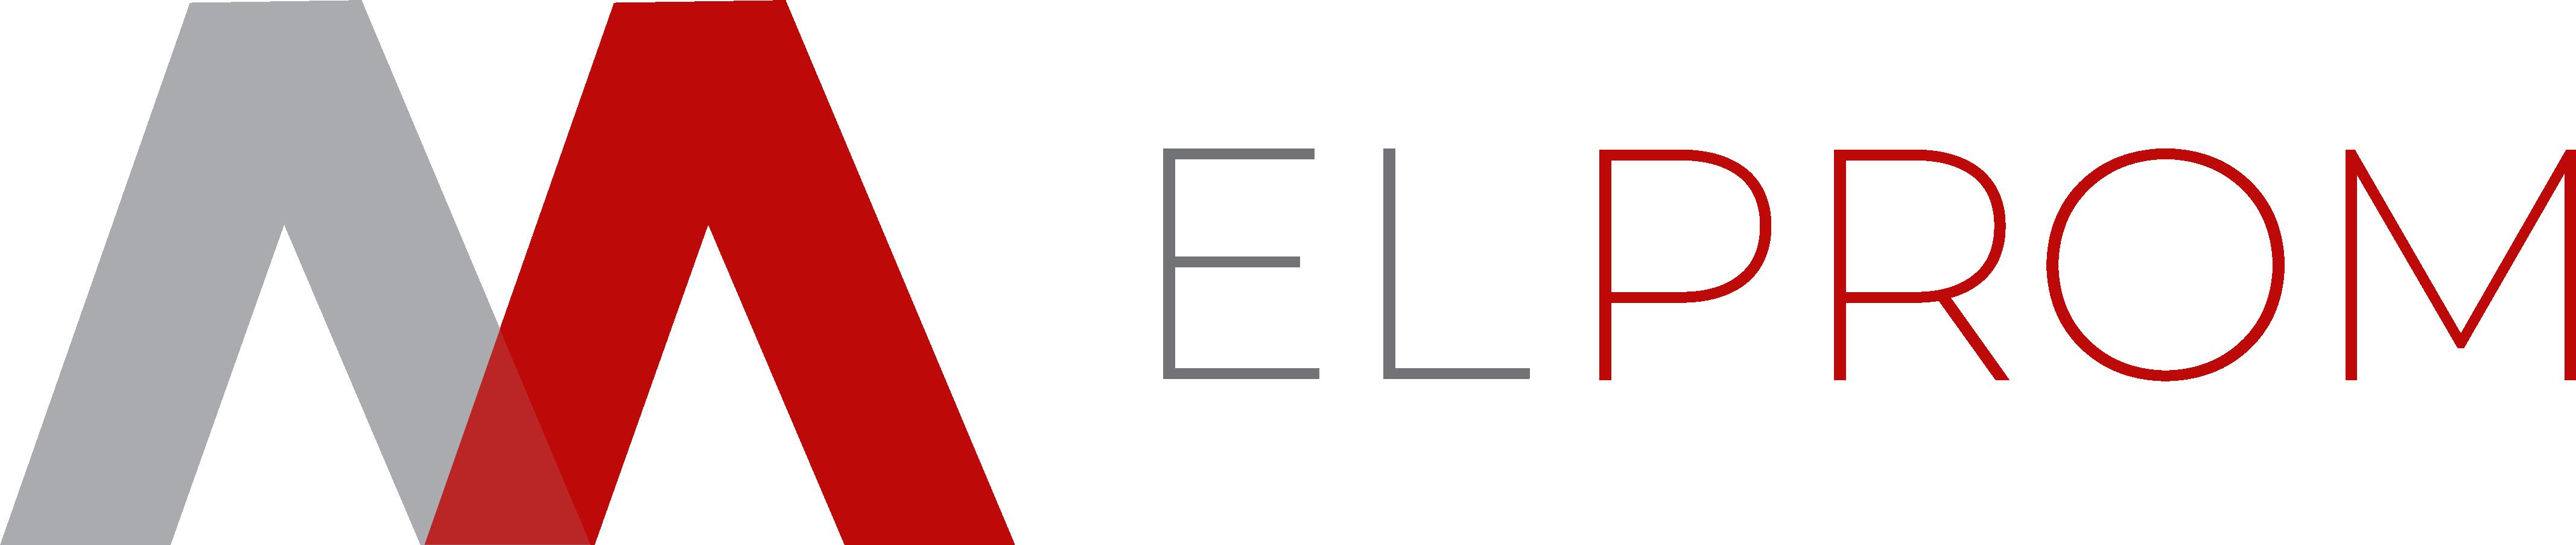 Elprom